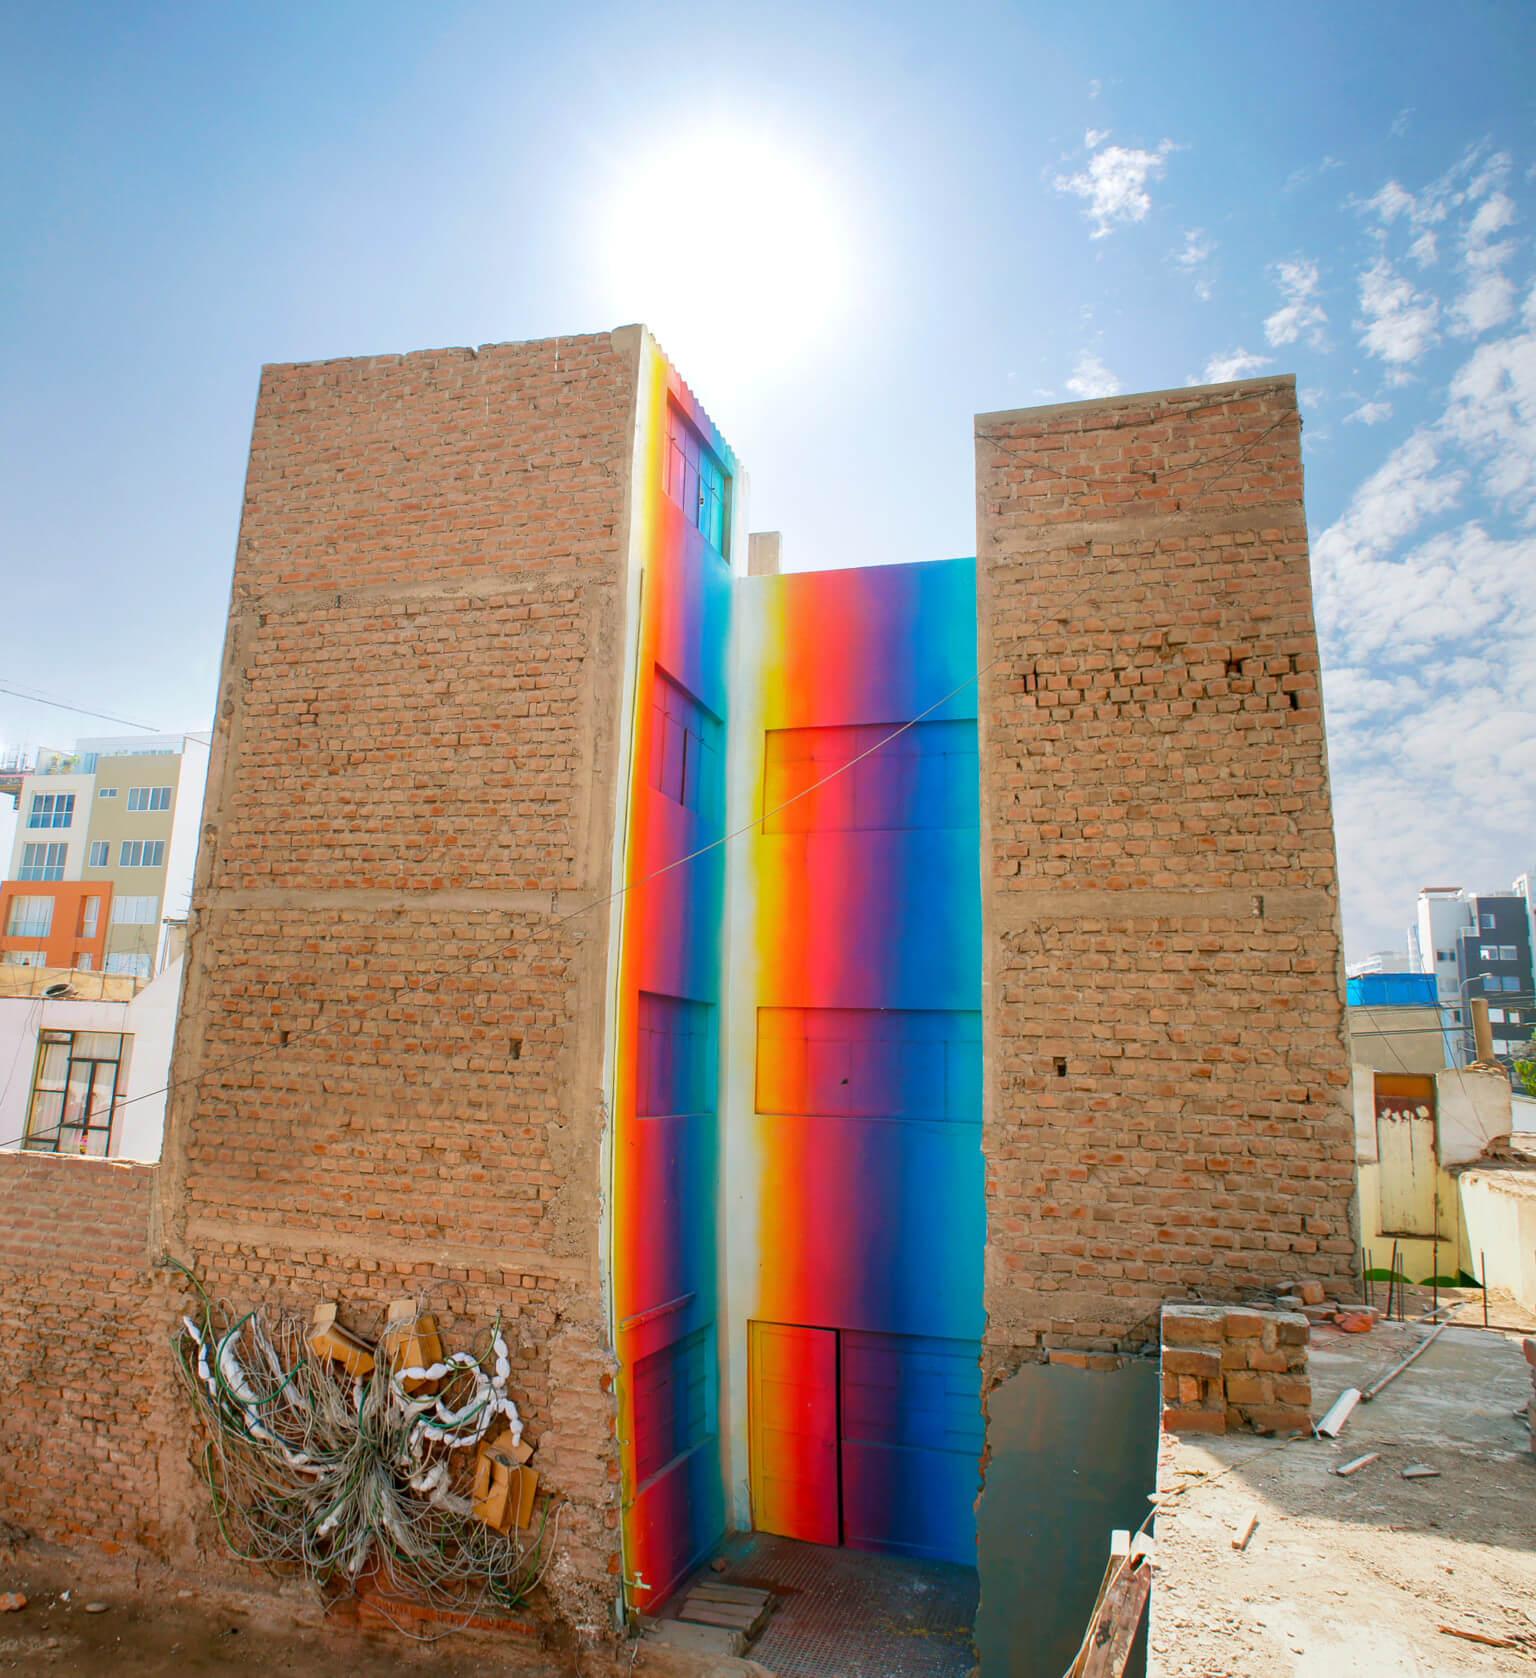 Xomatok: El street artist peruano que lleva prismas de graffiti a las calles de Lima